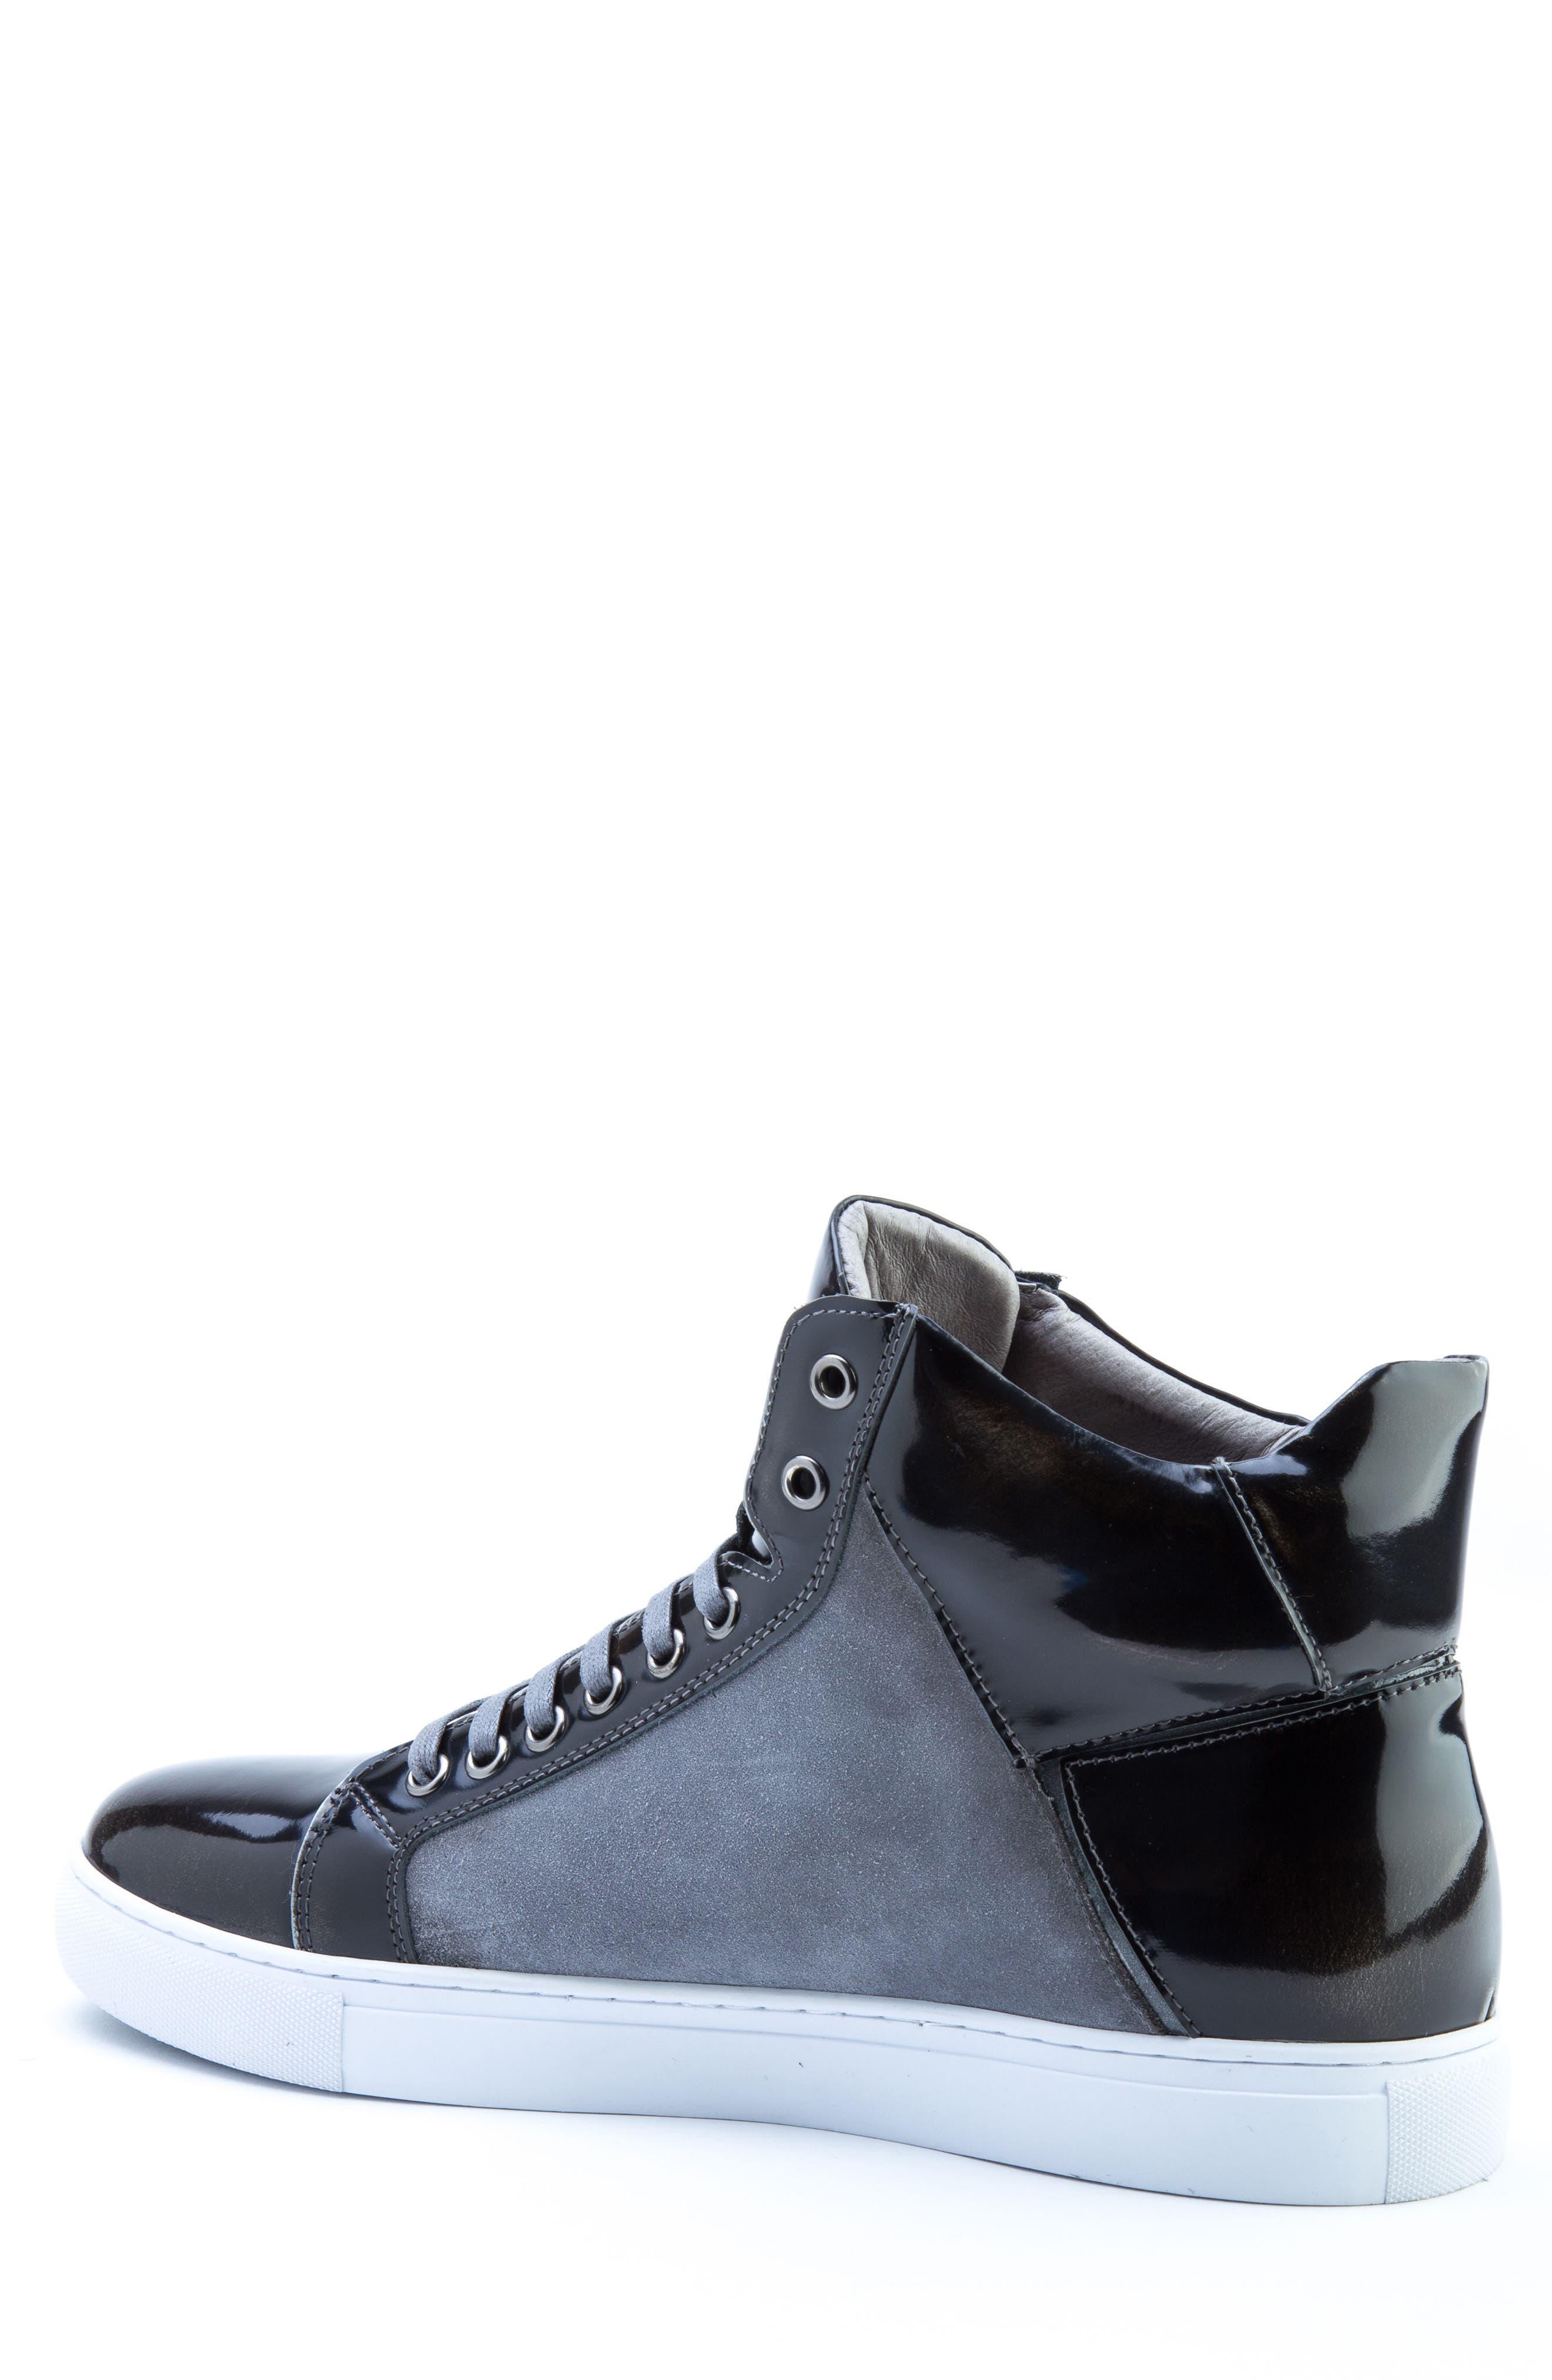 Douglas High Top Sneaker,                             Alternate thumbnail 2, color,                             BLACK LEATHER